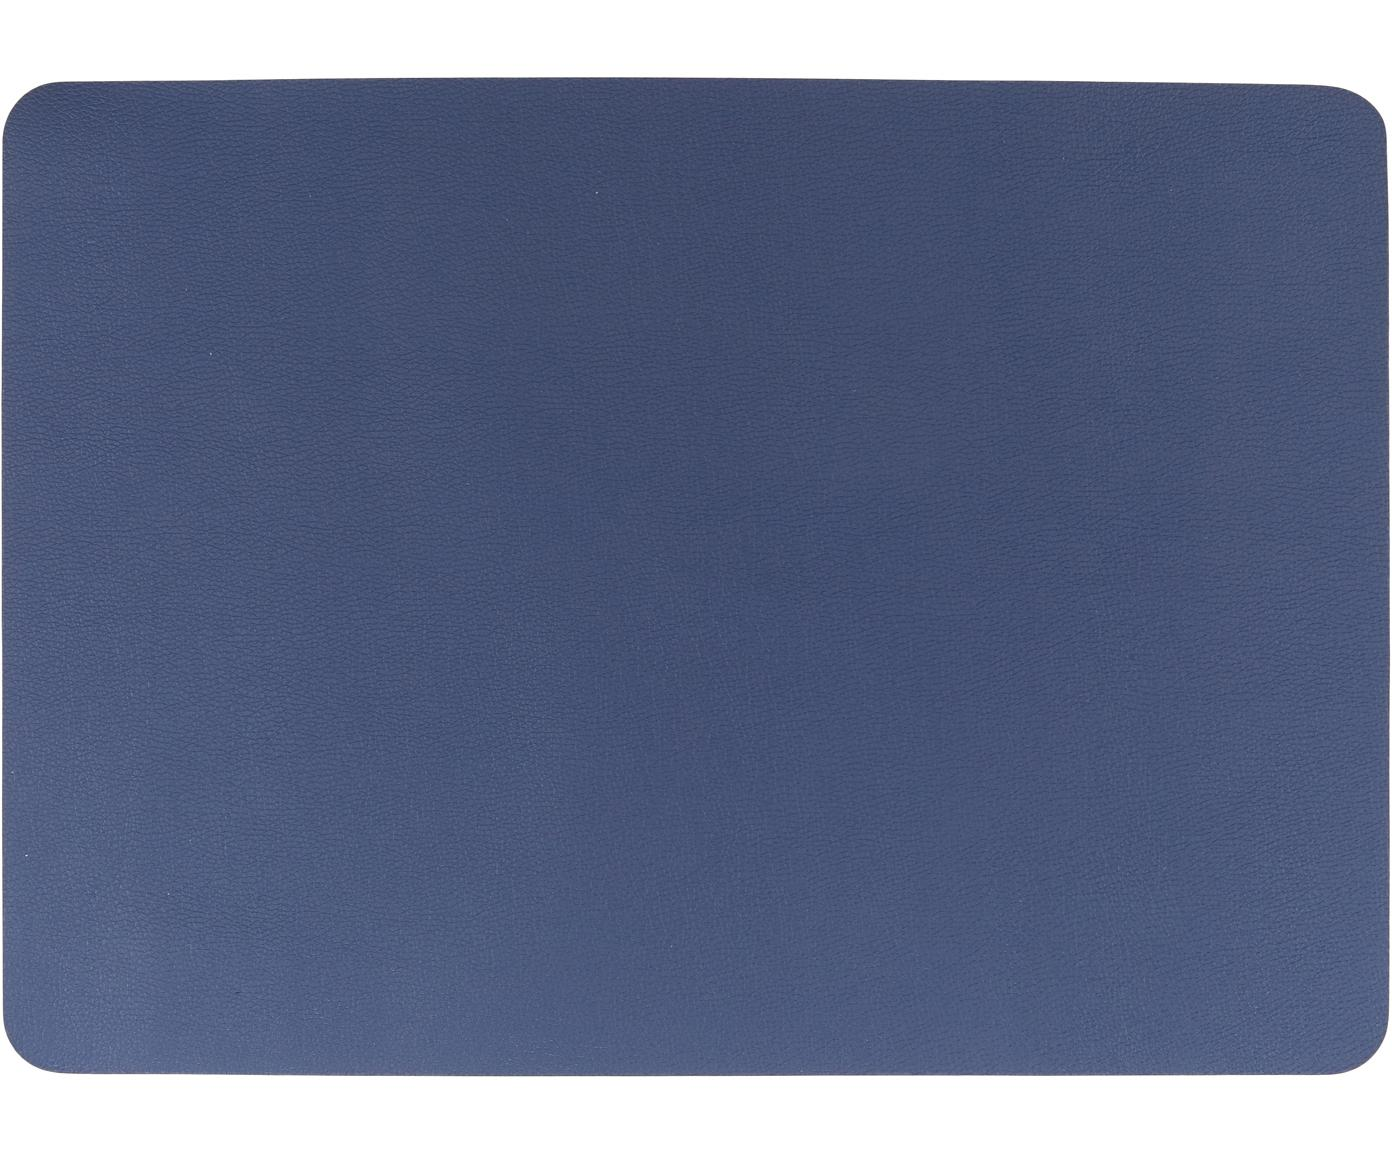 Kunstleder-Tischsets Pik, 2 Stück, Kunstleder (PVC), Navy, 33 x 46 cm